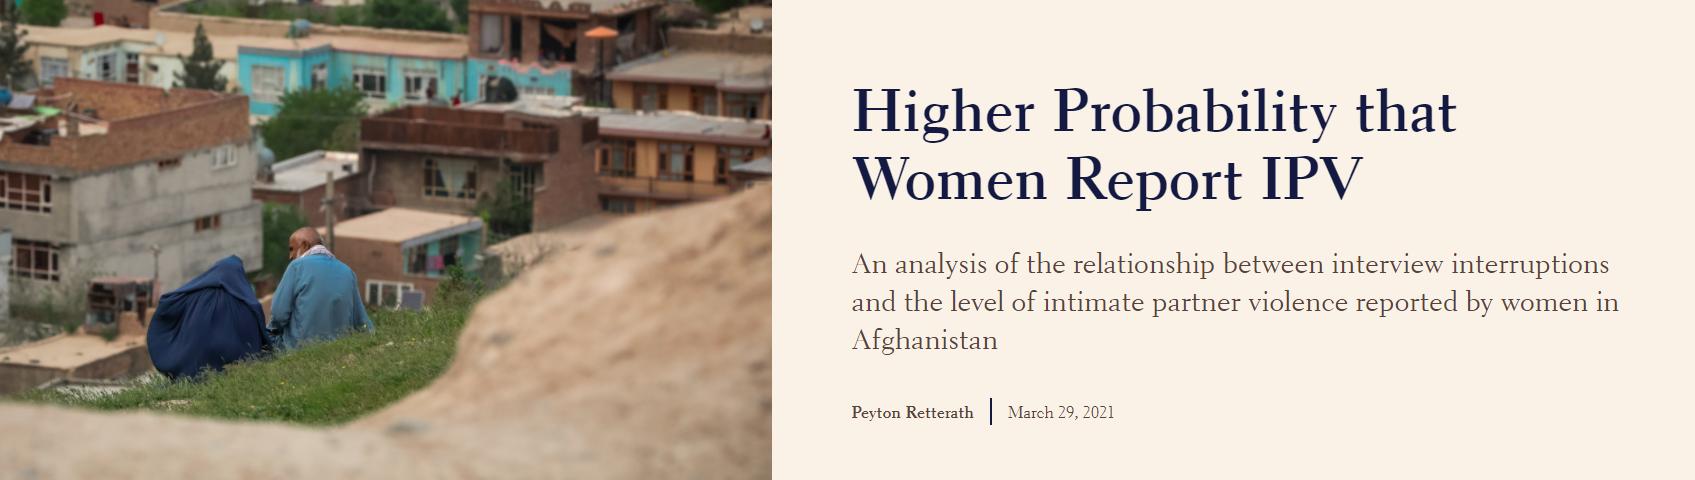 Higher Probability that Women Report IPV